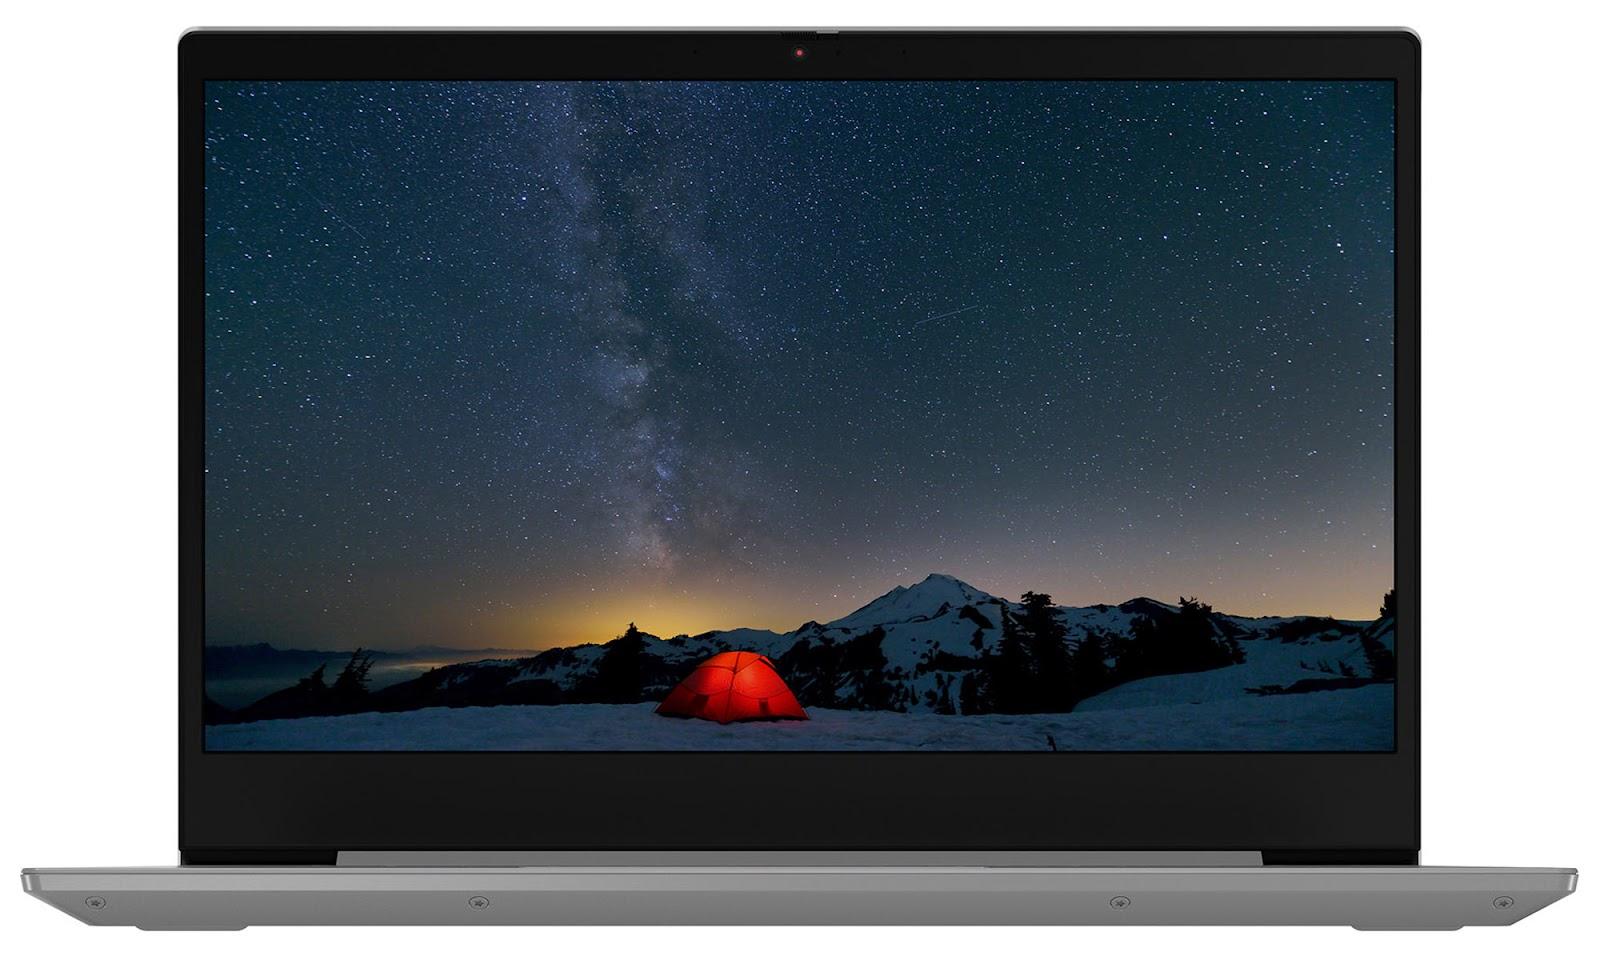 Фото 1. Ноутбук Lenovo ThinkBook 14 IIL (20SL000LRU)